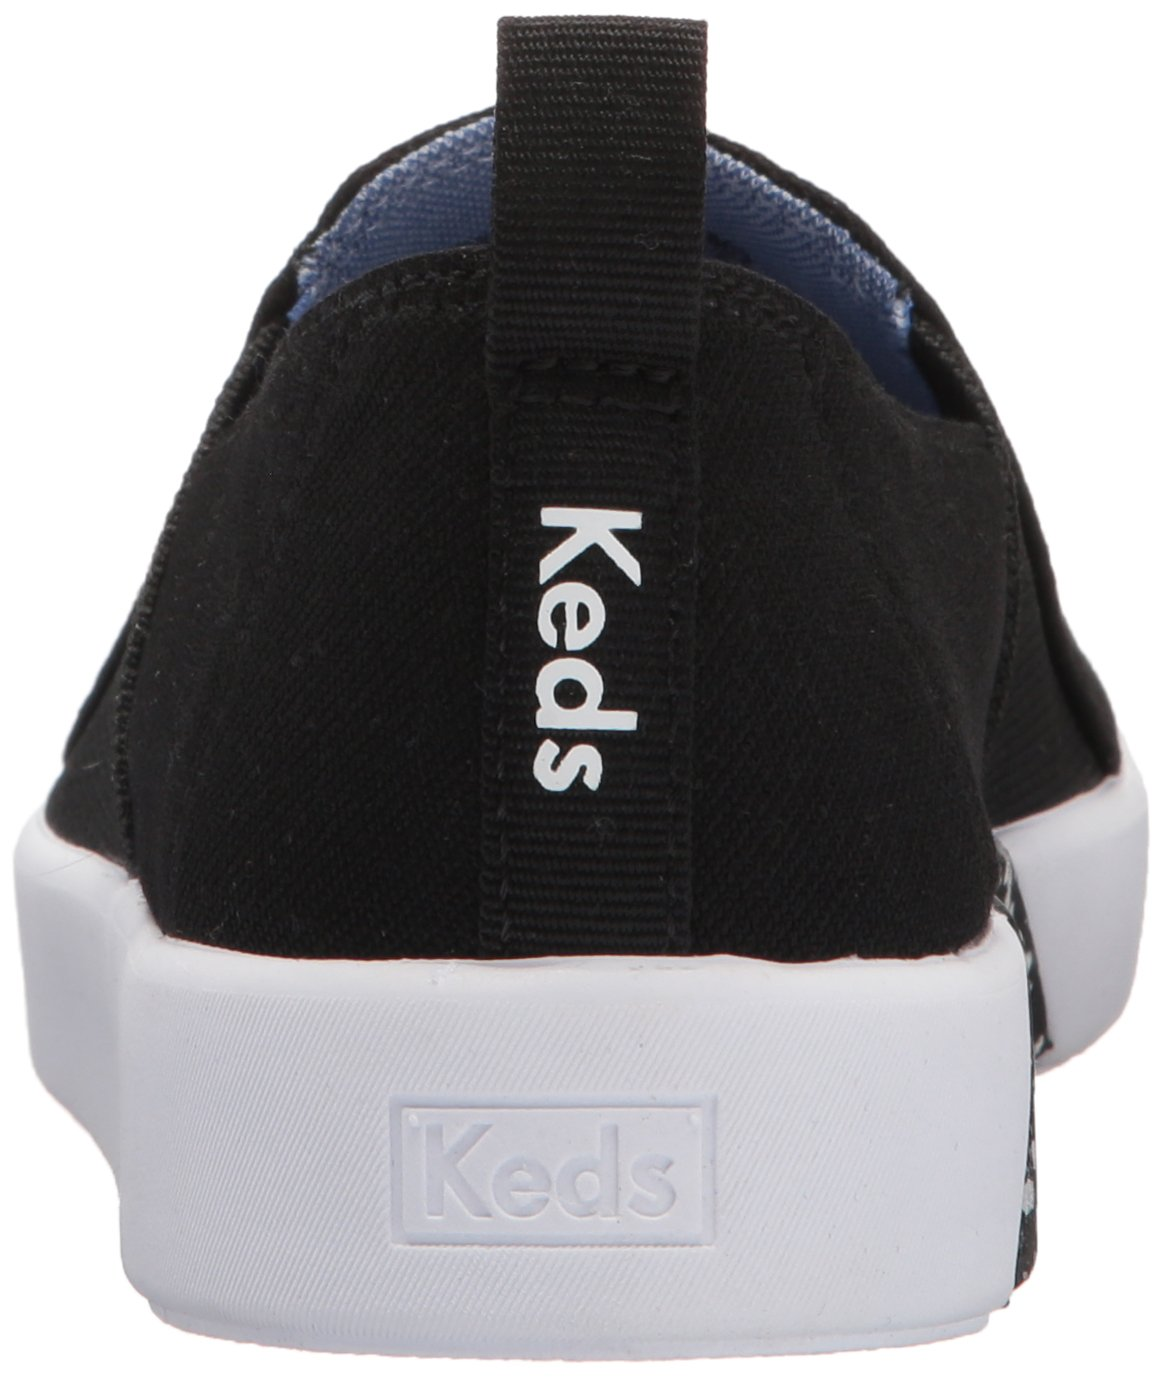 Keds Women's Liv Studio Jersey Sneaker B072X8YFV1 9 B(M) US|Black